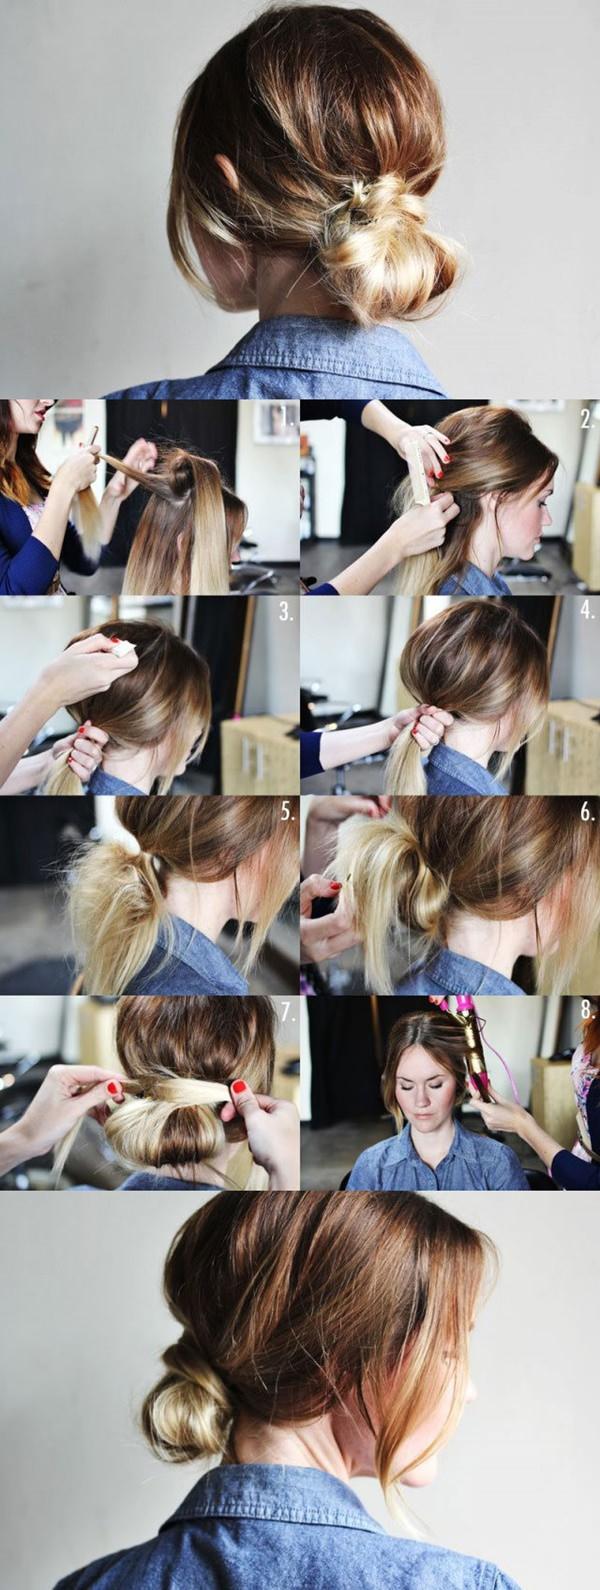 26easy-updos-for-long-hair-100416